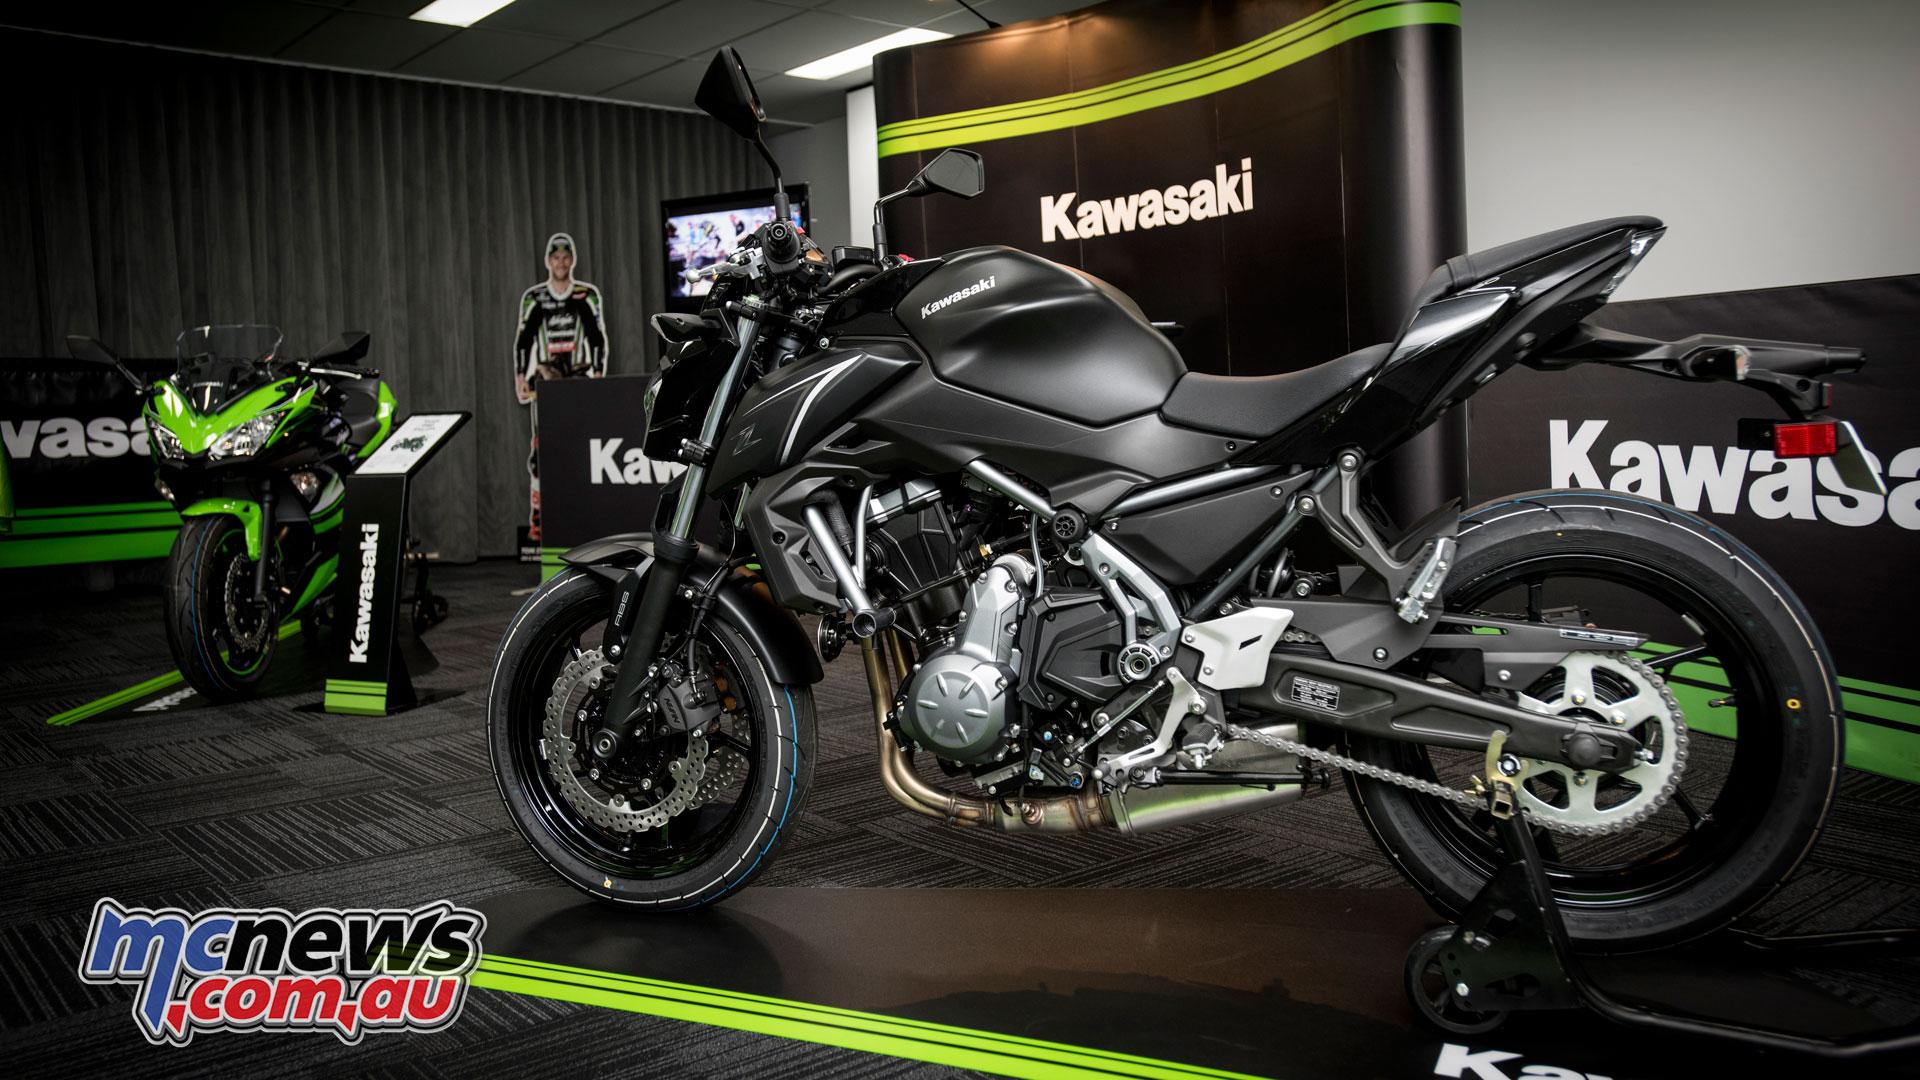 Kawasaki Z650 On Display At HQ In Sydney